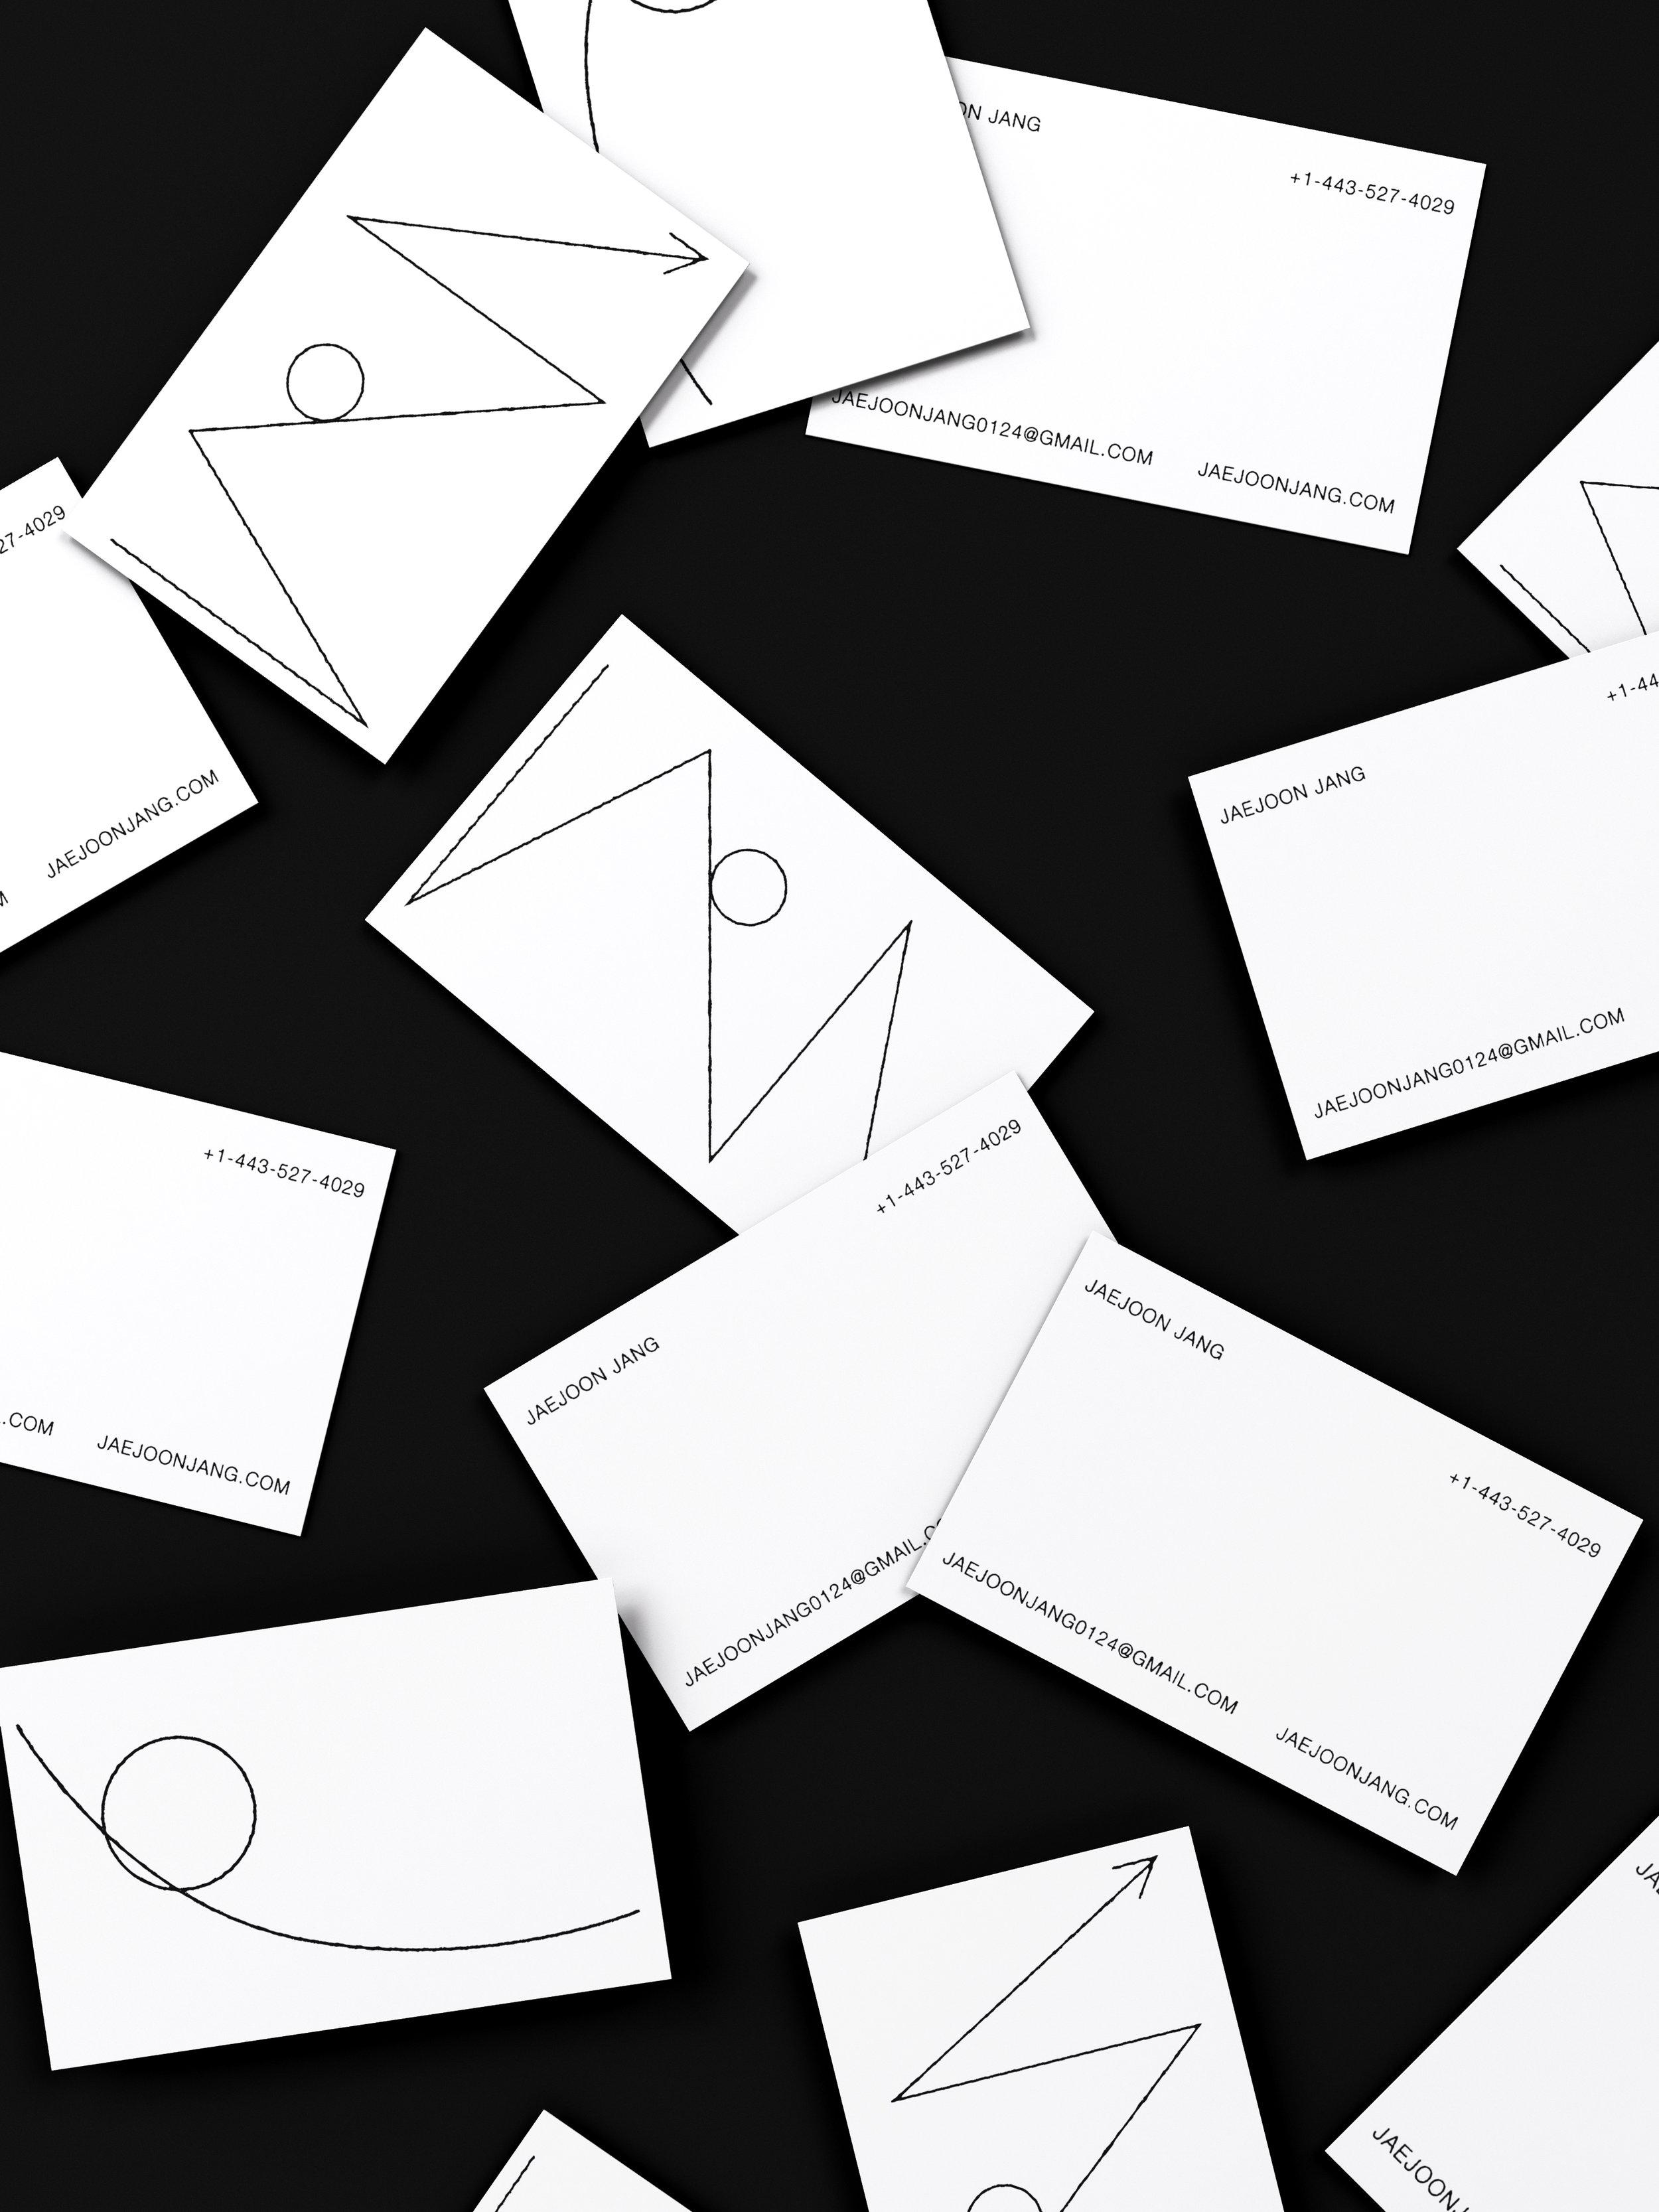 Business Cards Mockup_01.jpg